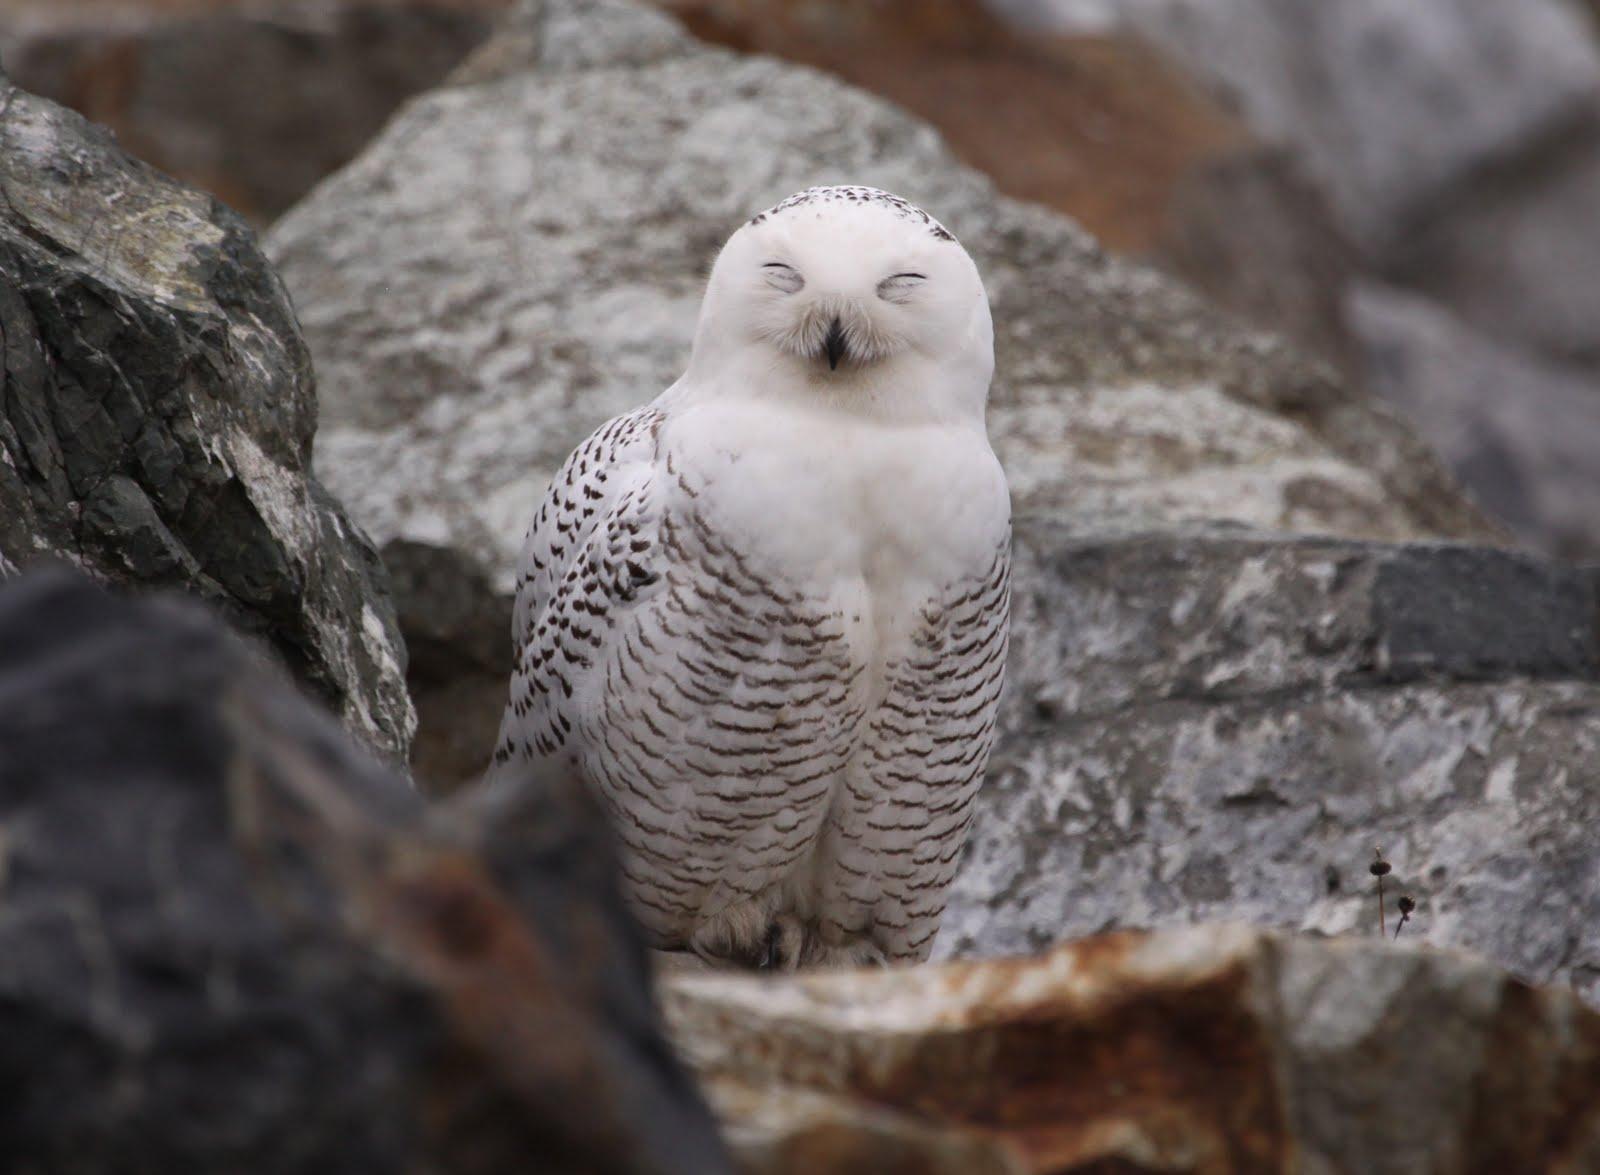 Michael and Winnie's Sweet Home: 雪鴞 Snowy Owl 來了